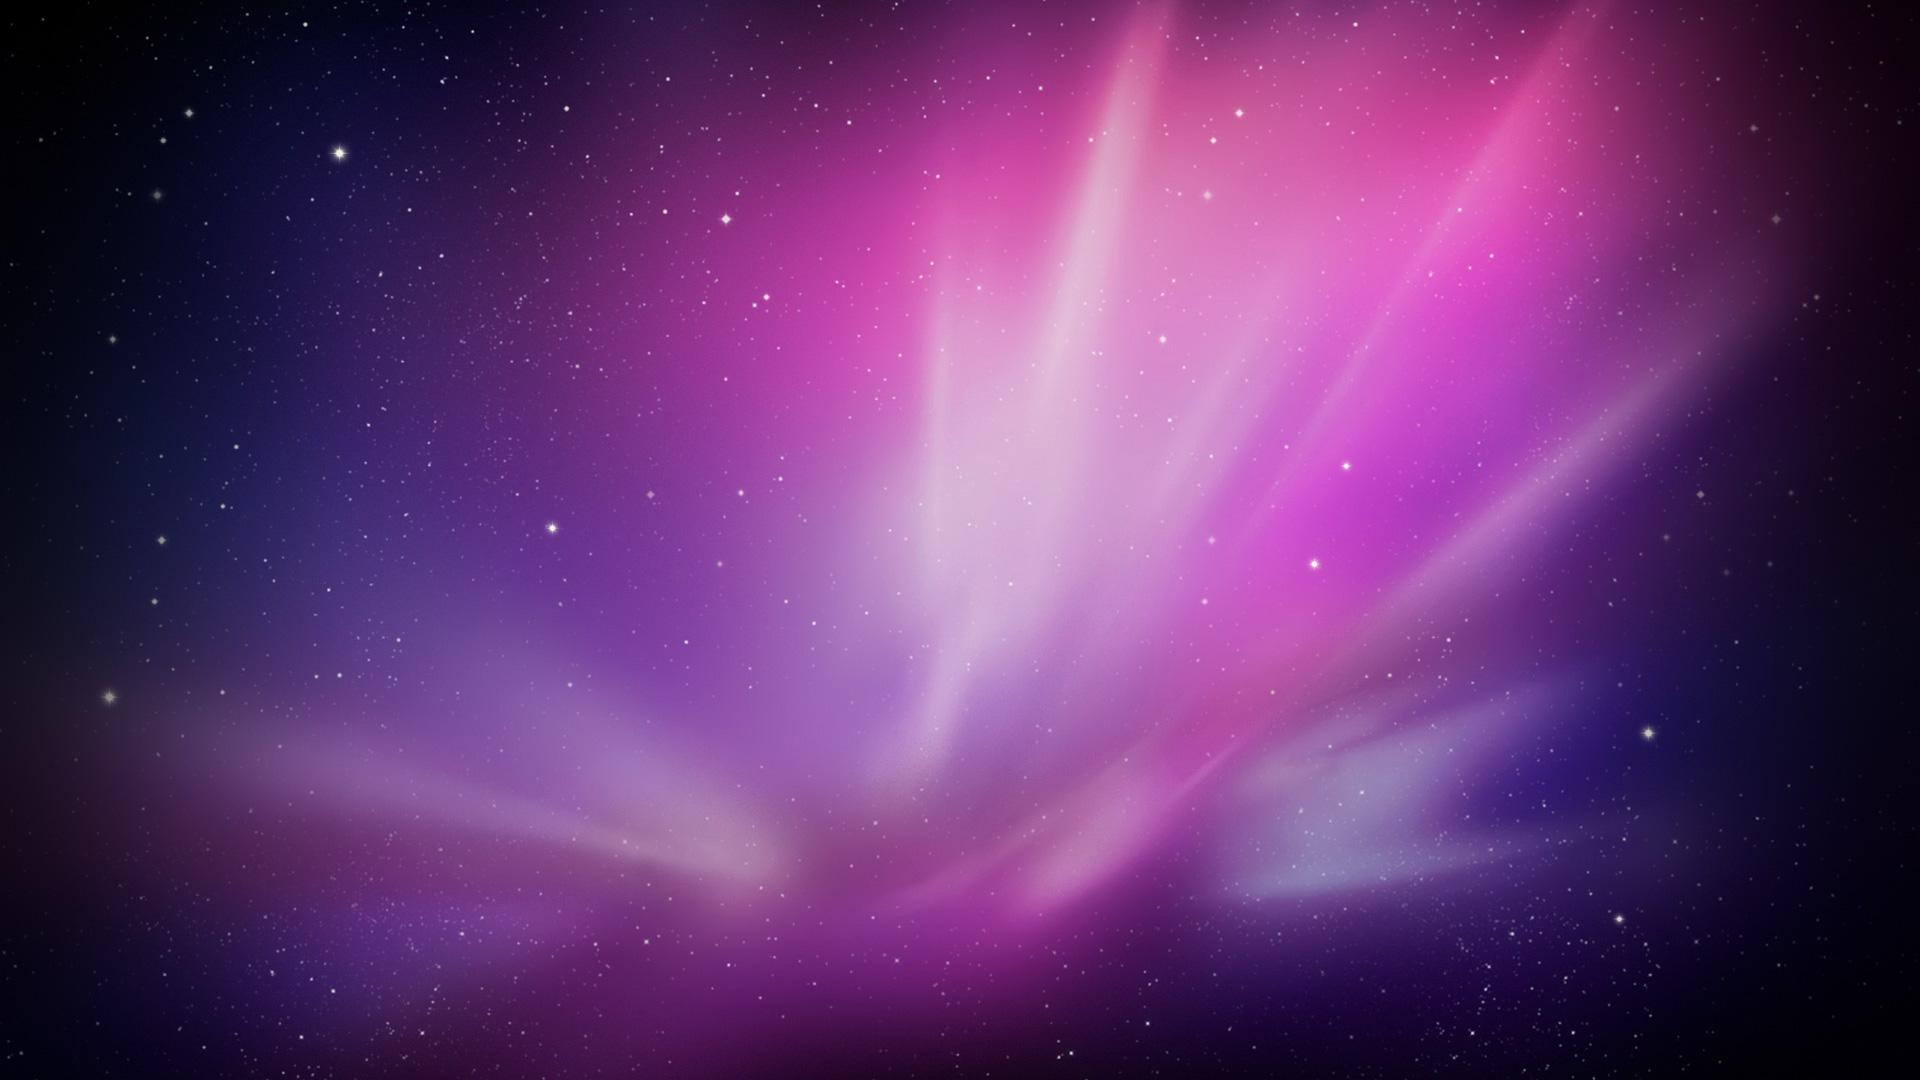 mac os x snow leopard wallpaper hd tech full hd wallpapers download 1080p desktop backgrounds